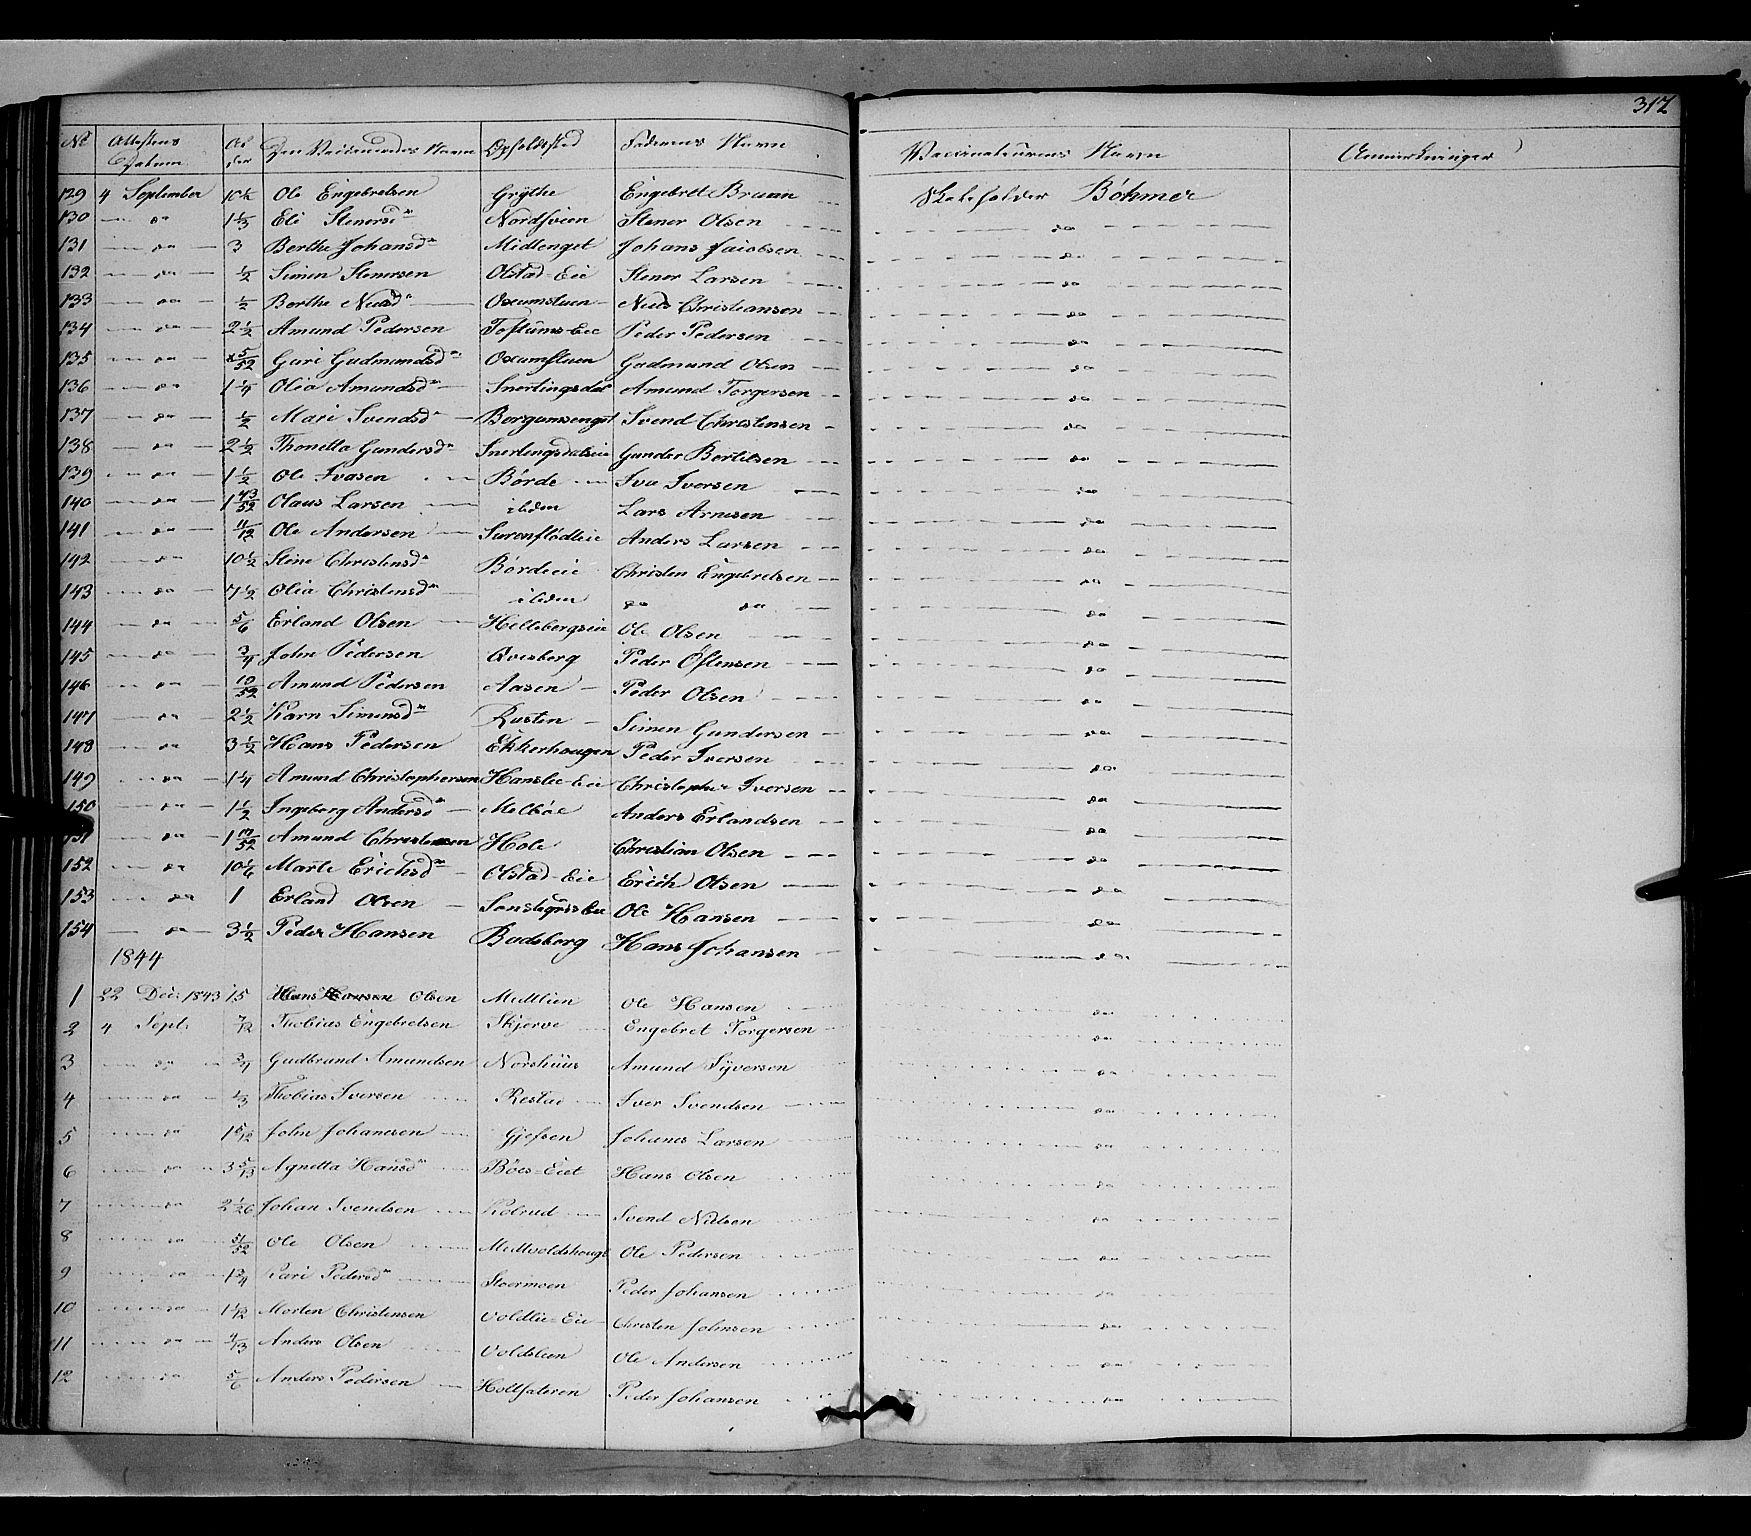 SAH, Gausdal prestekontor, Ministerialbok nr. 7, 1840-1850, s. 317